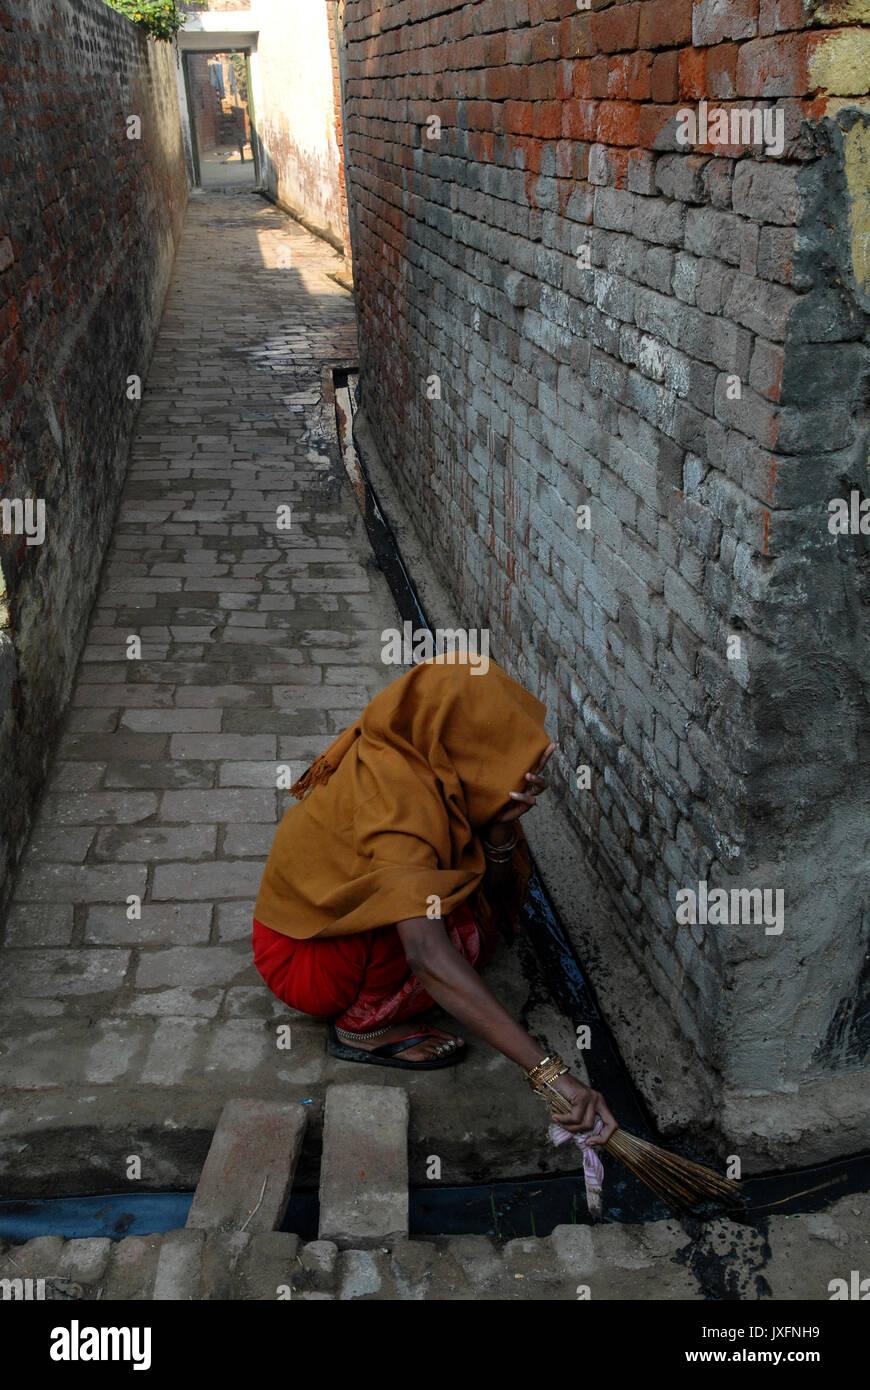 India UP Meerut , dalit woman clean toilets and sewage canal for higher caste households in village Kurali  / INDIEN U.P. Meerut, Kastensystem, Dalit Frau reinigt Toiletten und Abwasserkanal fuer hoeherkastige Haushalte  im Dorf Kurali - - Stock Image